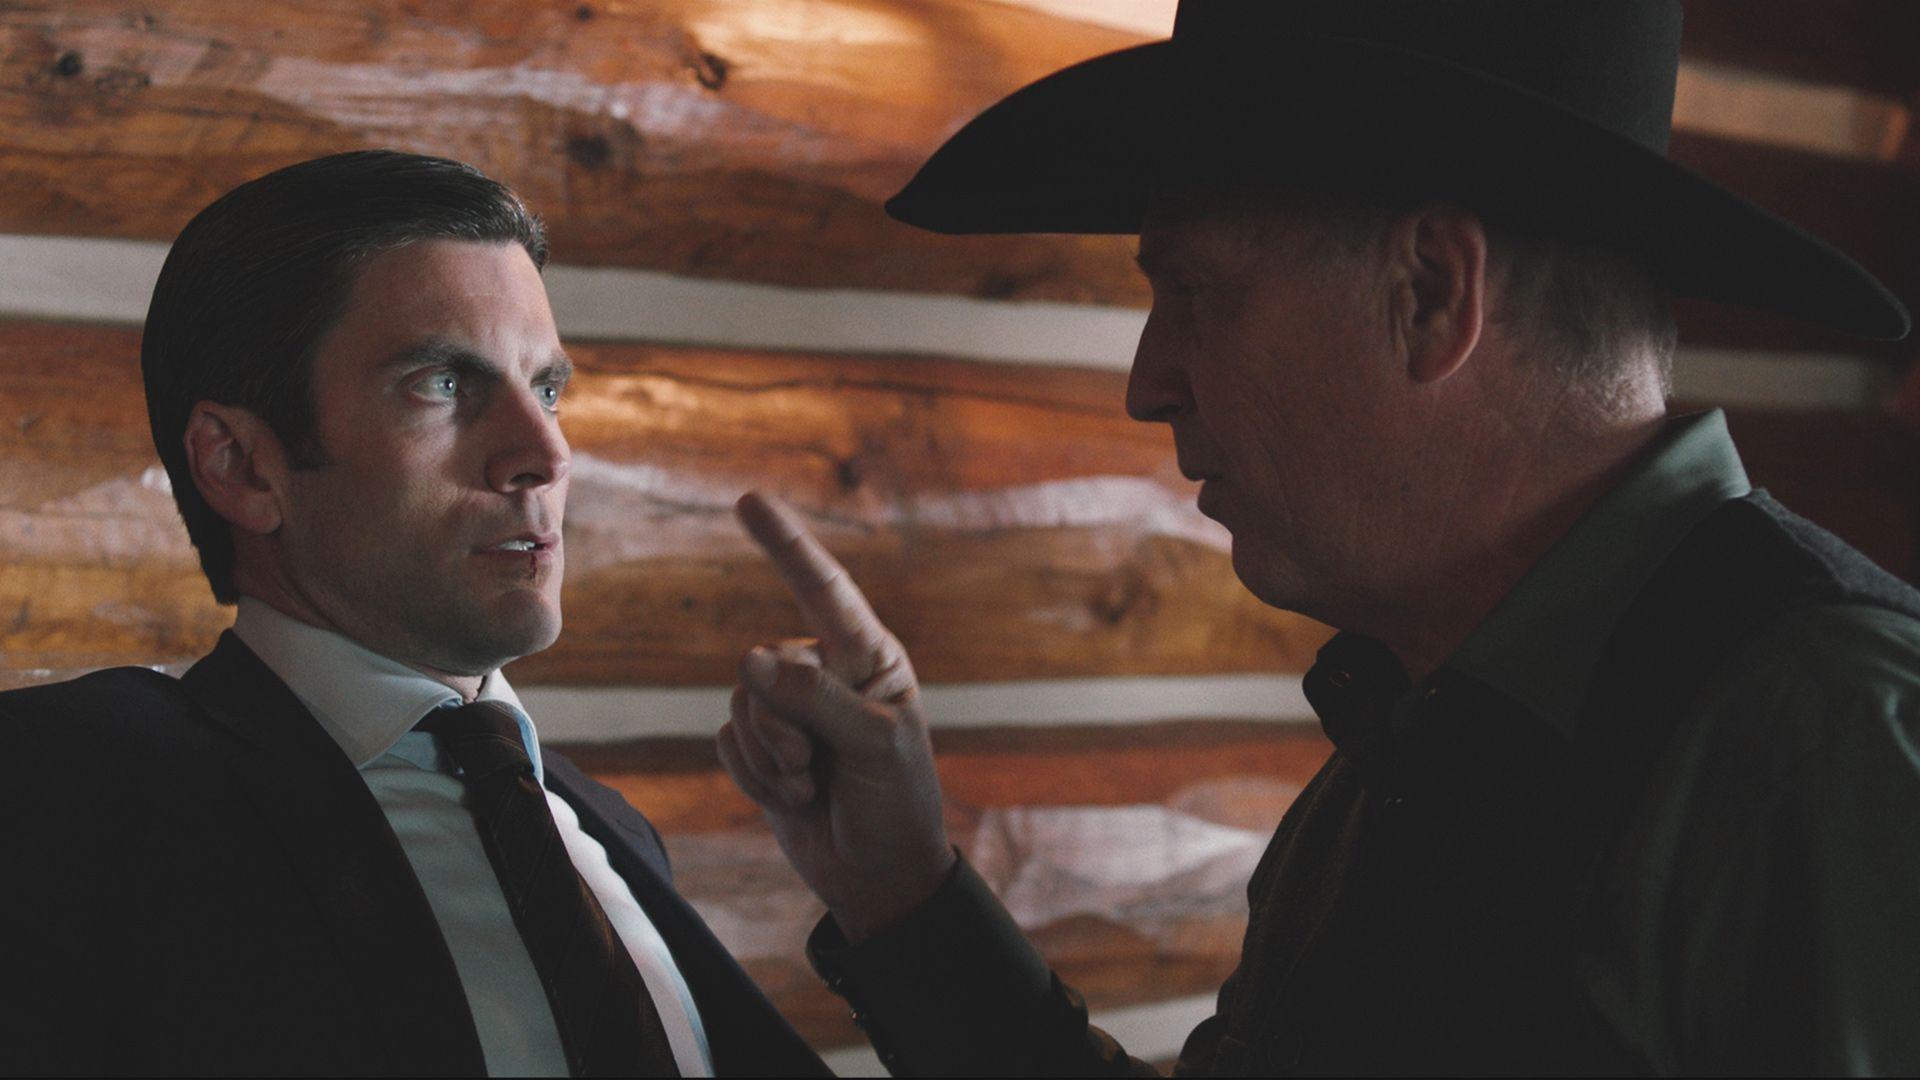 Yellowstone (2018) Season 1 Episode 9